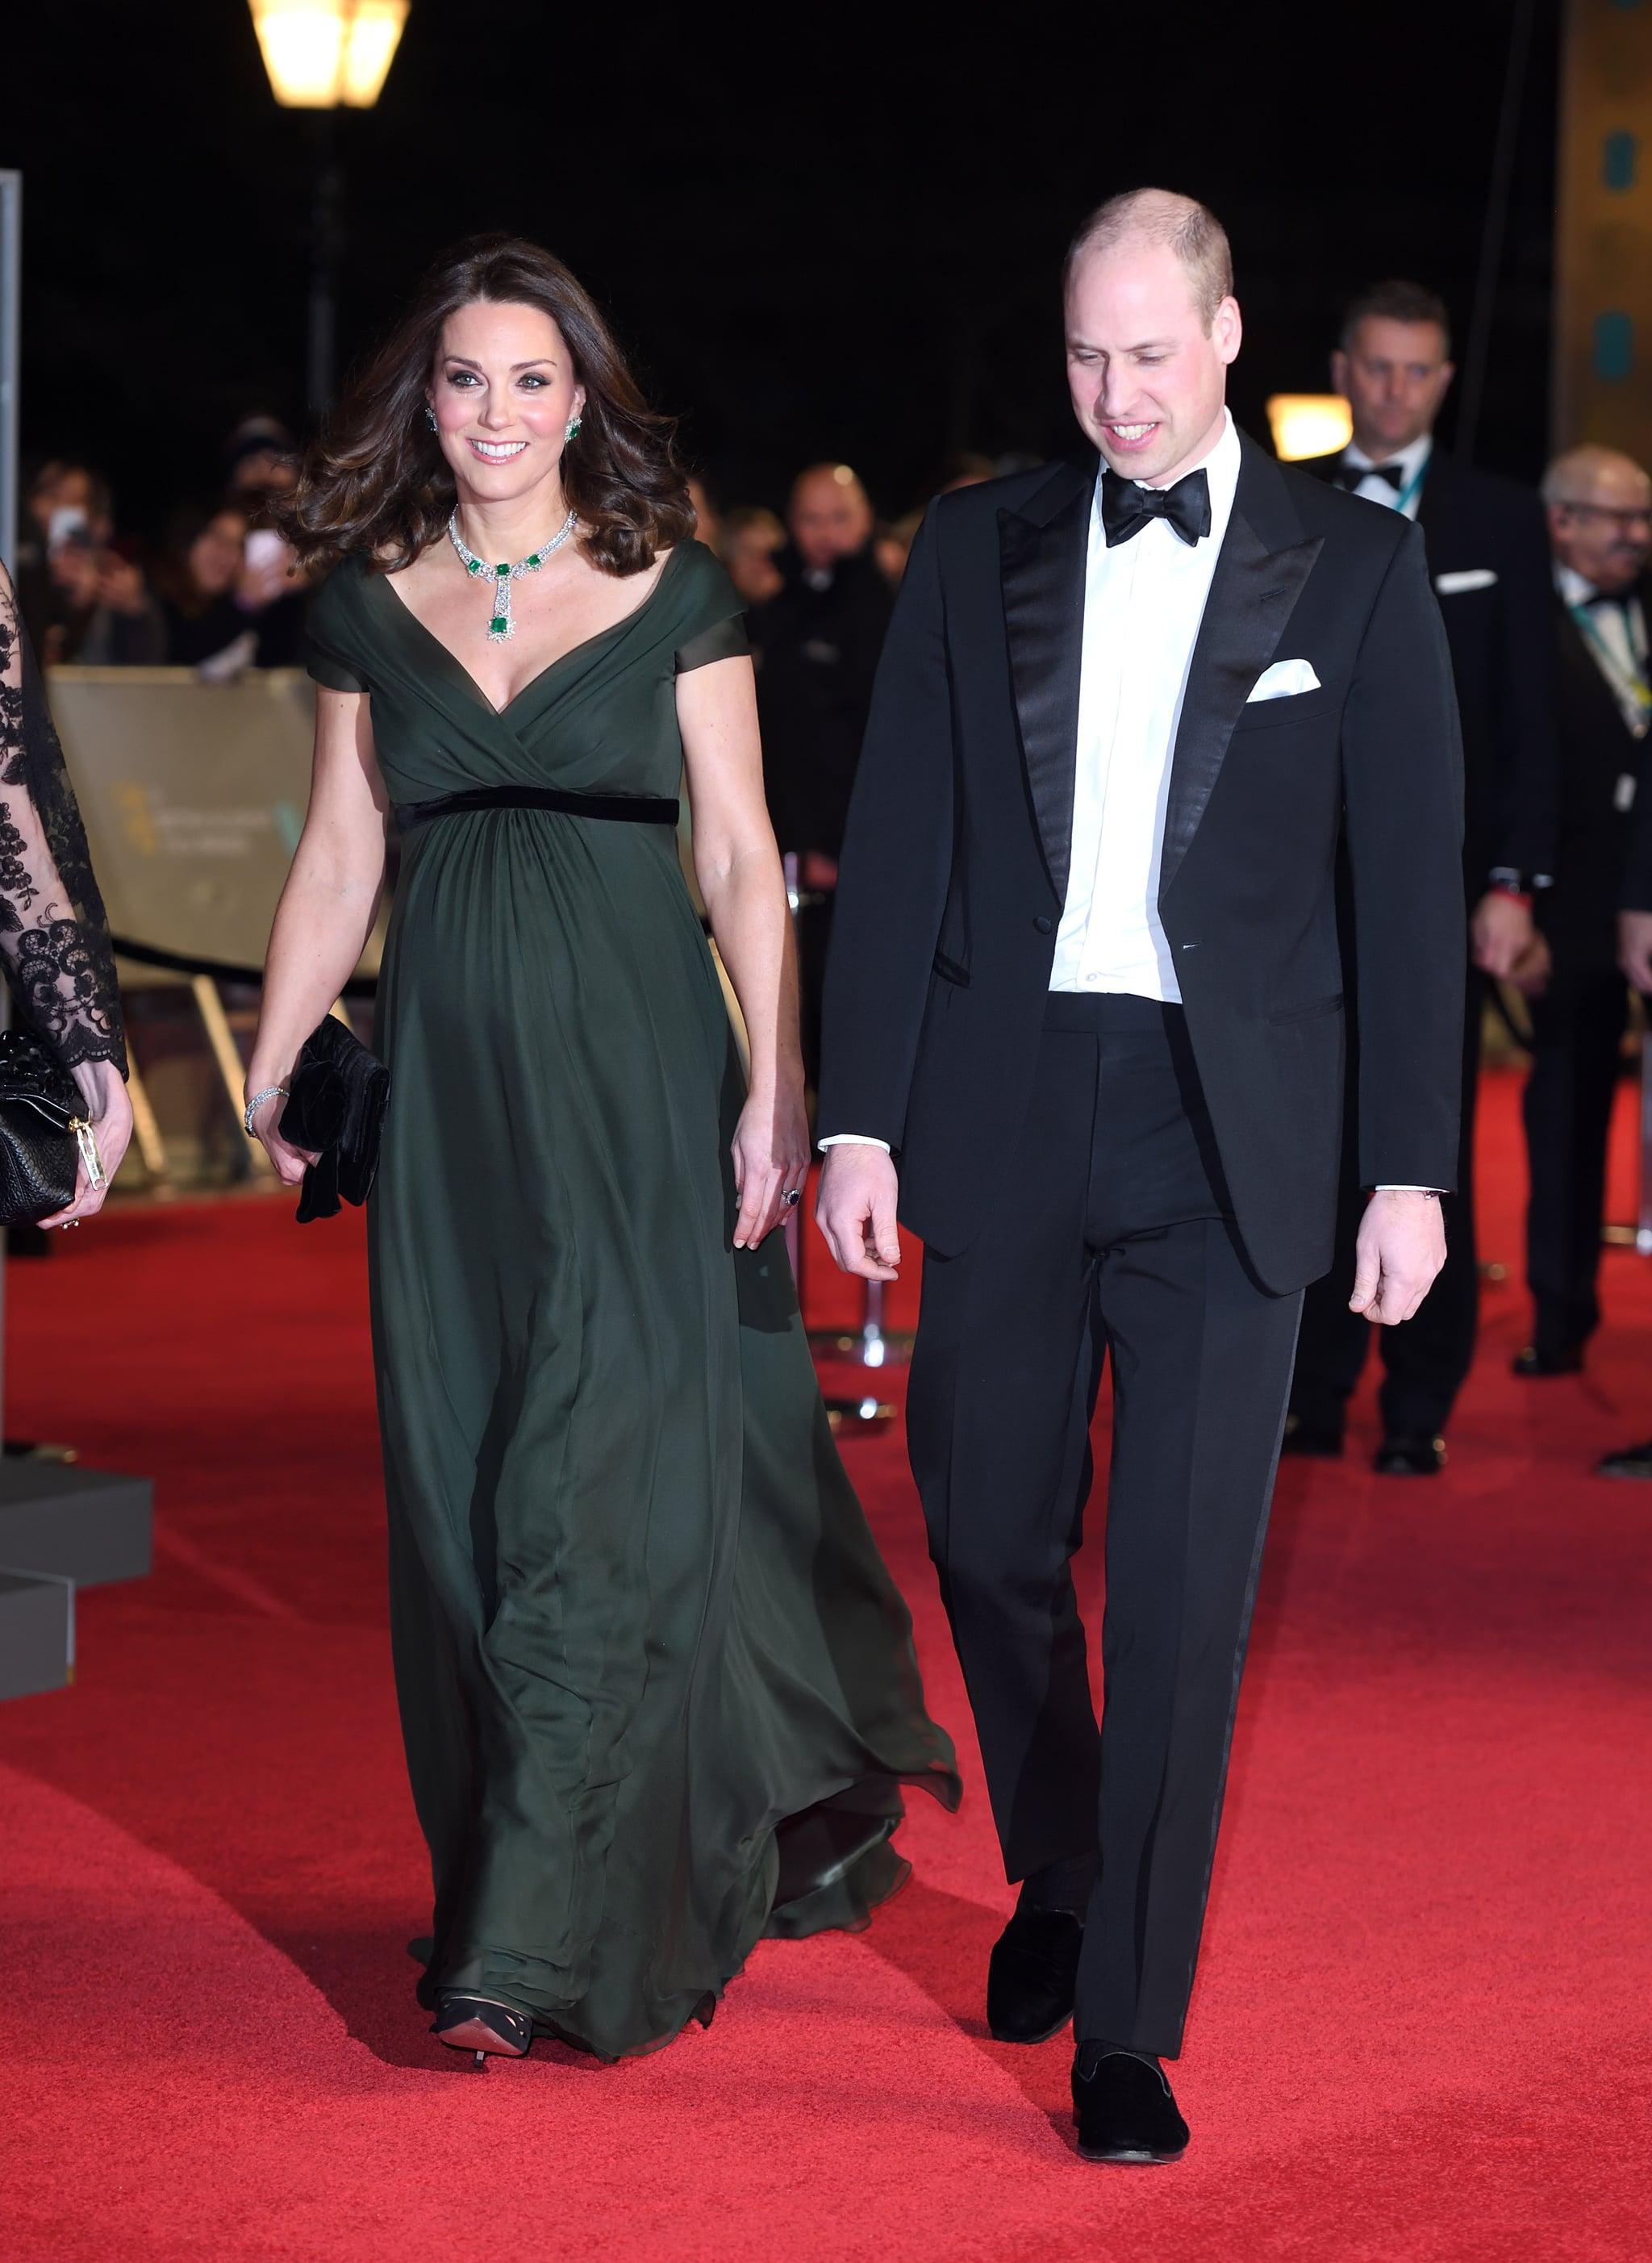 Why Didn\'t Kate Middleton Wear Black to the BAFTA Awards? | POPSUGAR ...